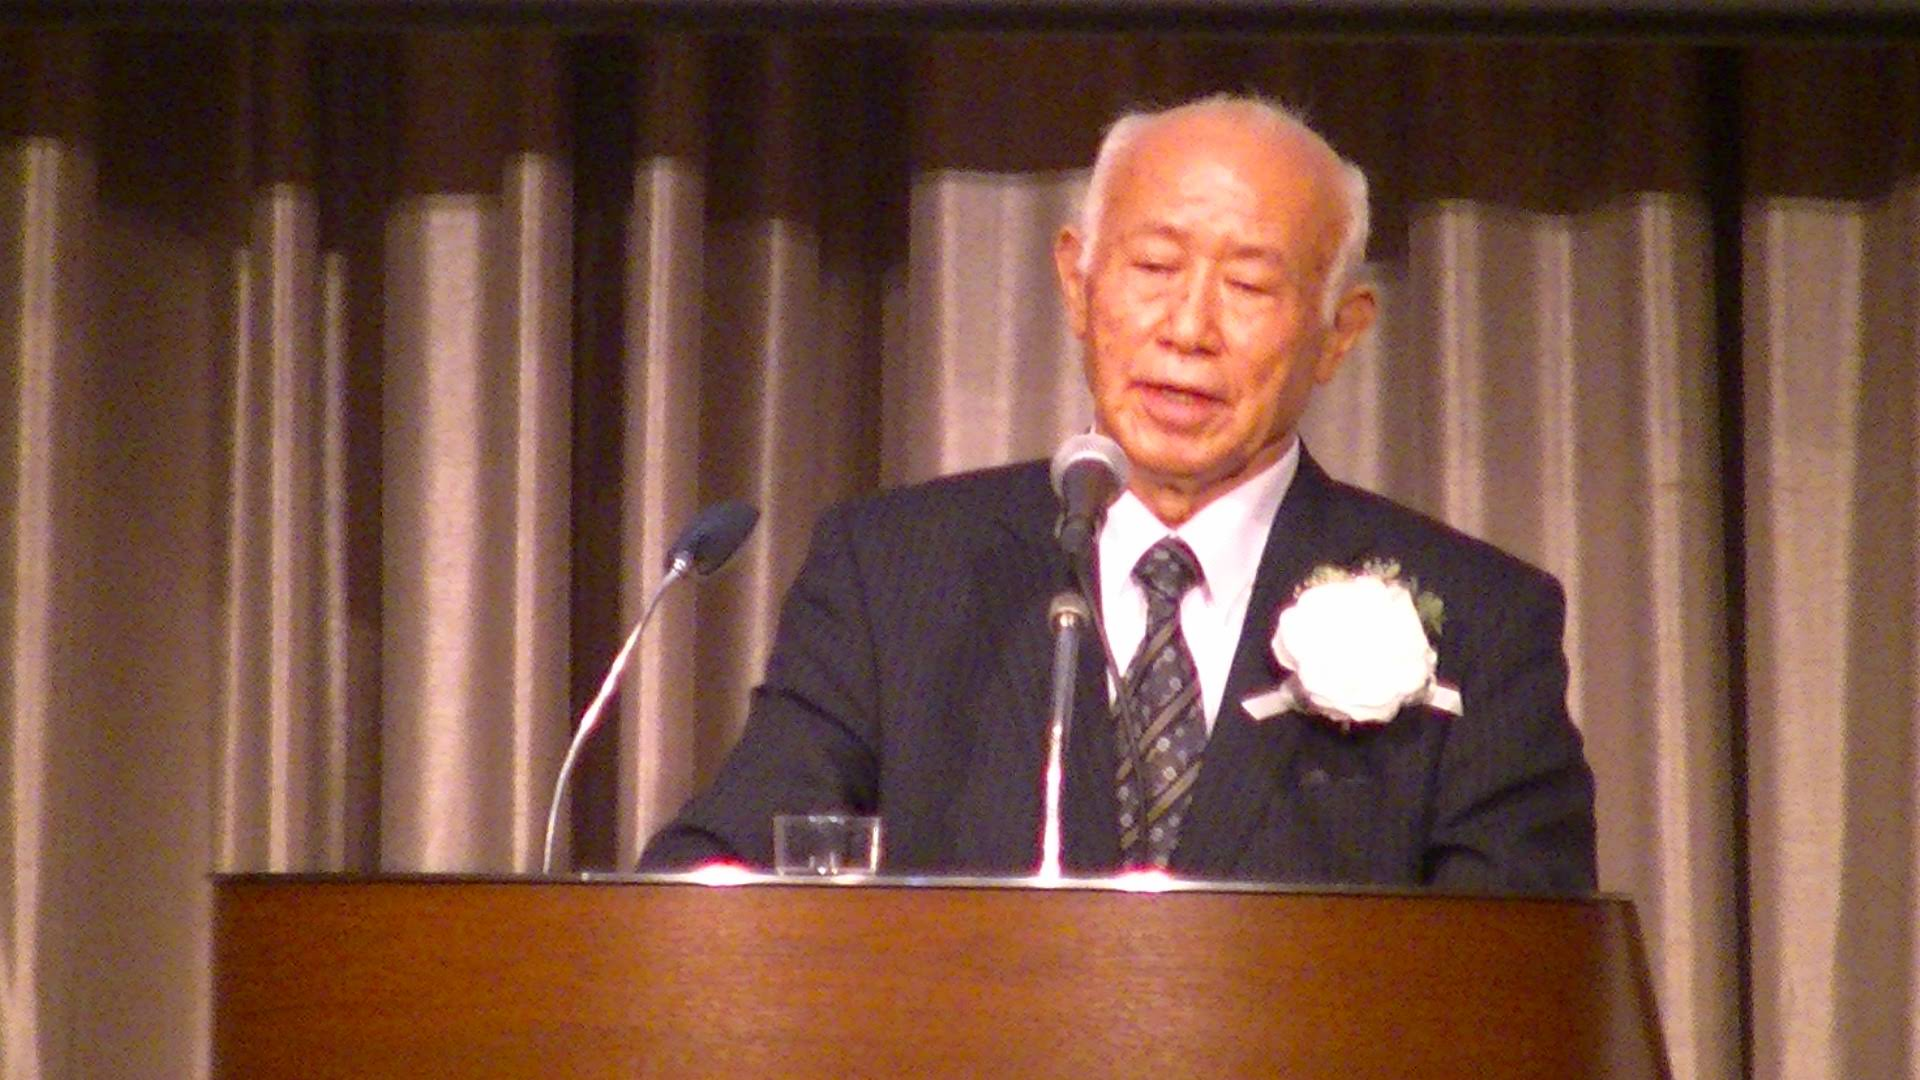 PIC 1728 1 - 思風会全国大会in広島